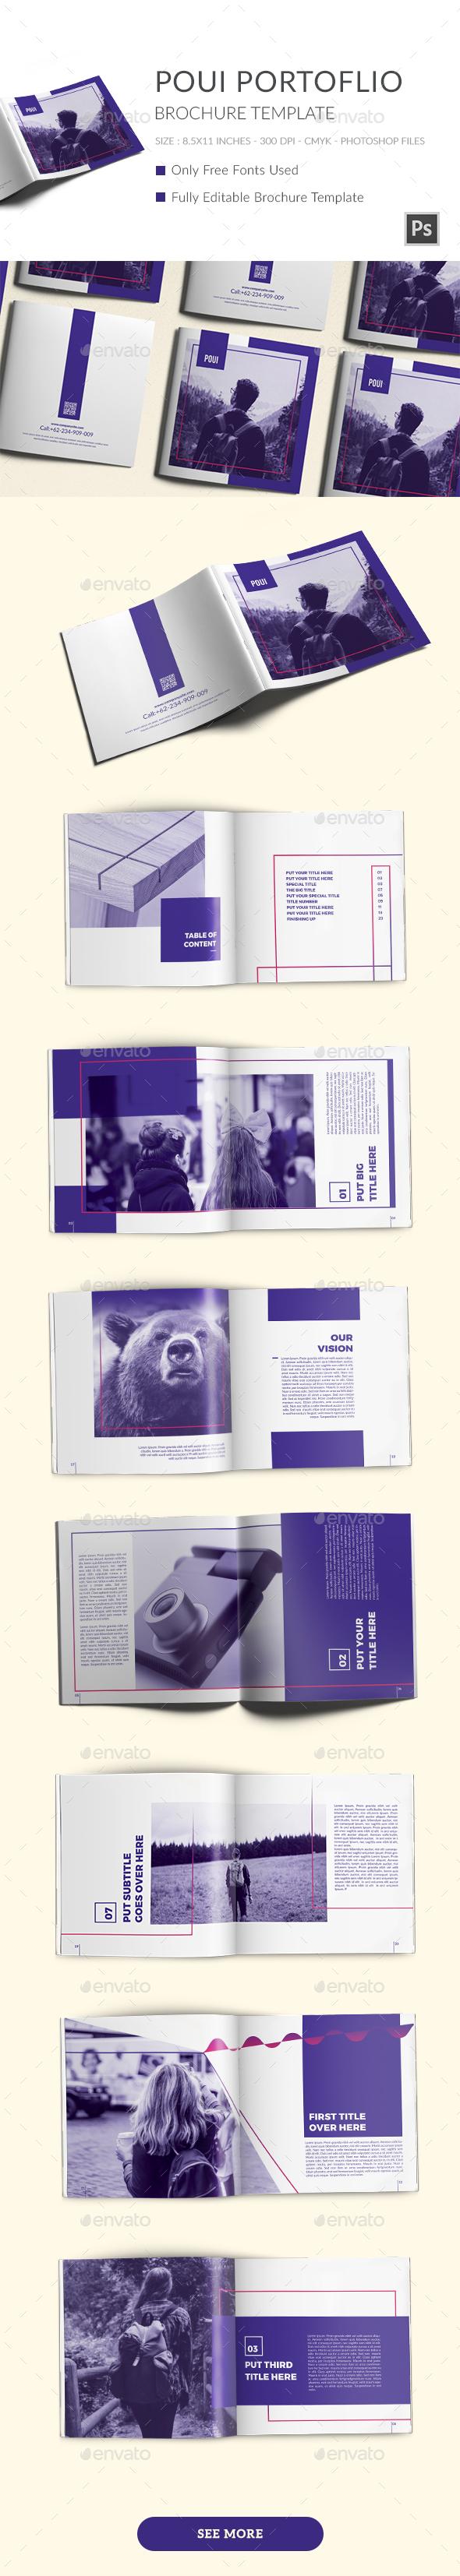 POUI Square Portfolio Brochure Template - Brochures Print Templates